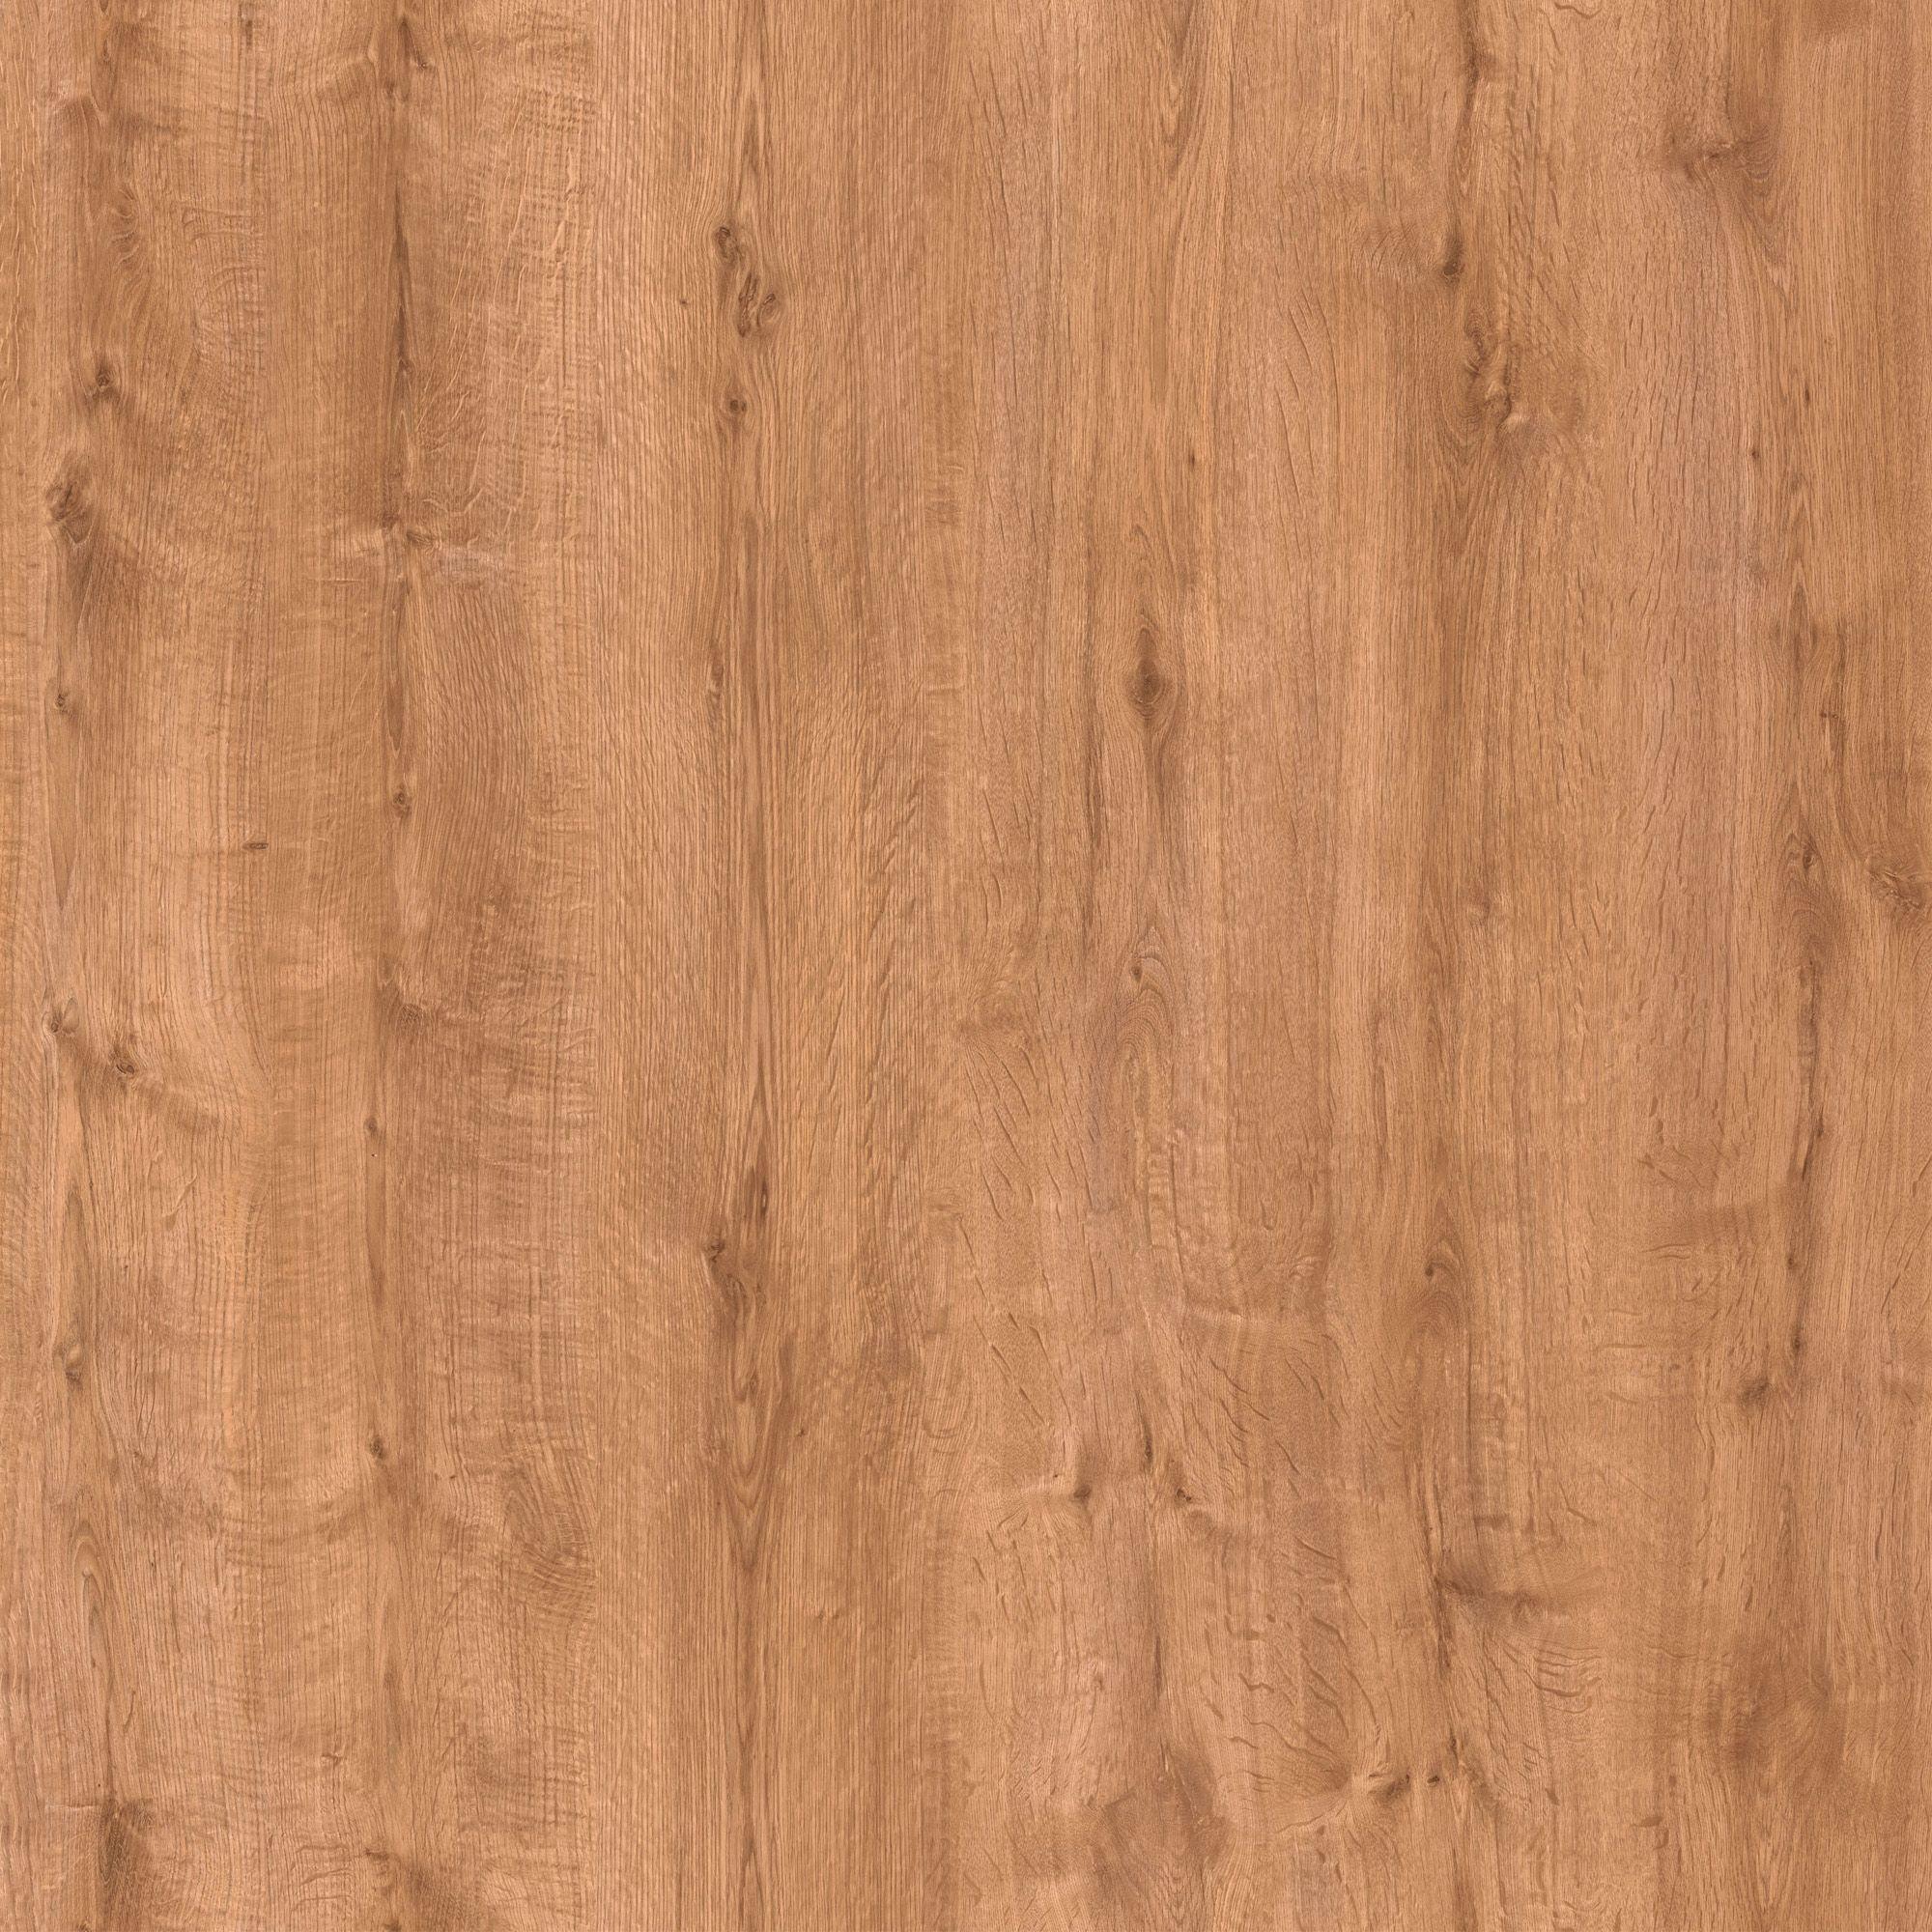 Bq Kitchen Laminate Flooring Concertino Oak Effect Laminate Flooring Sample Departments Diy